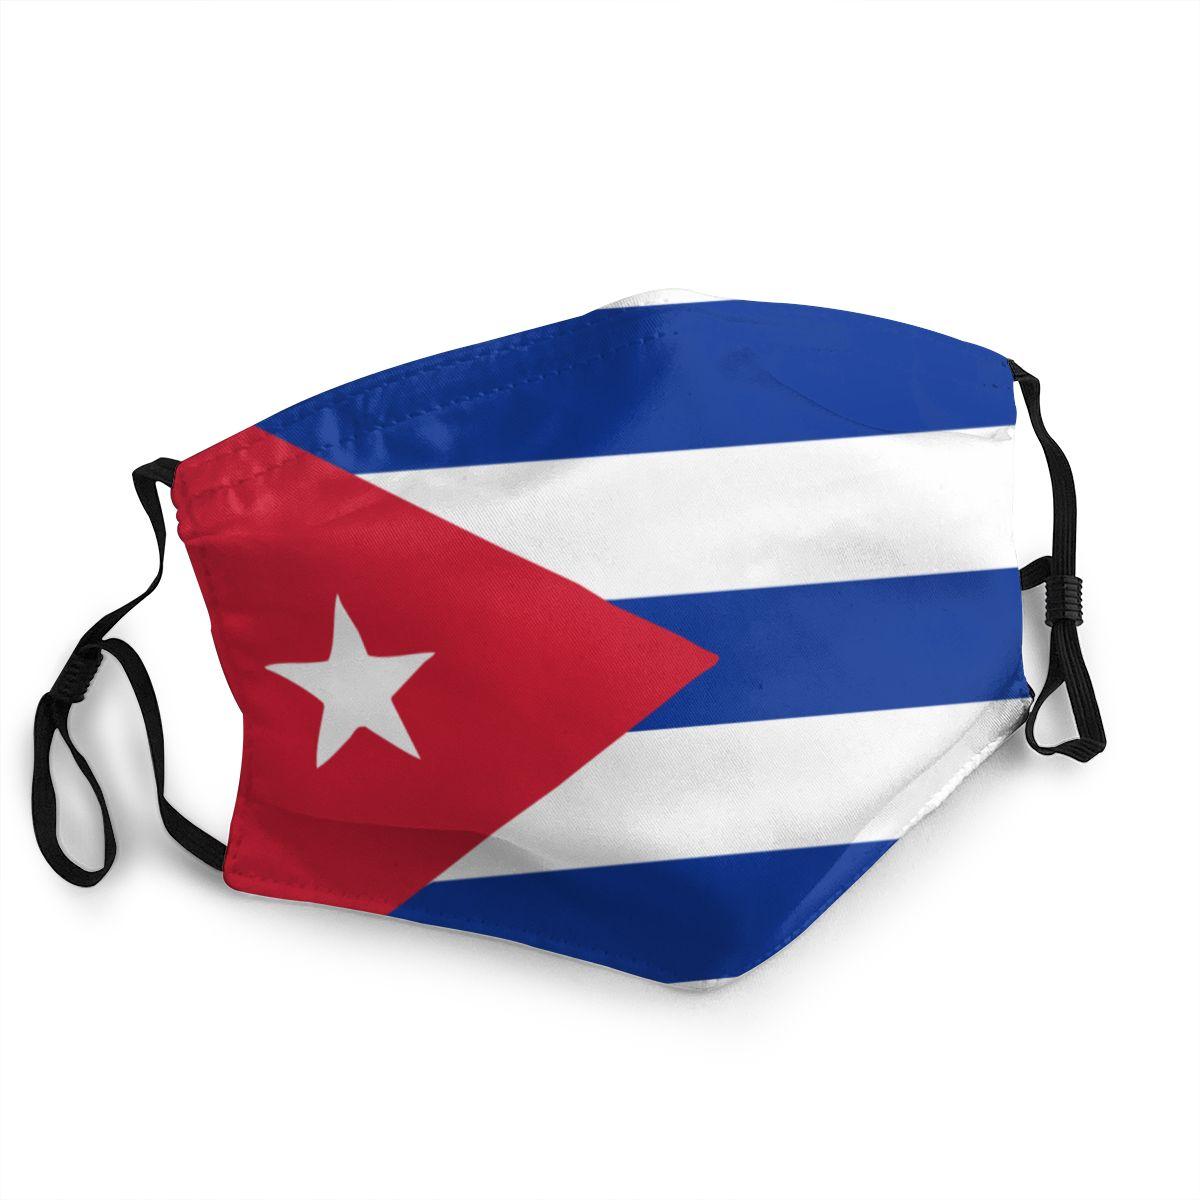 Cuba Cuban National Flag Reusable Mouth Face Mask Anti Haze Dust Protection Cover Respirator